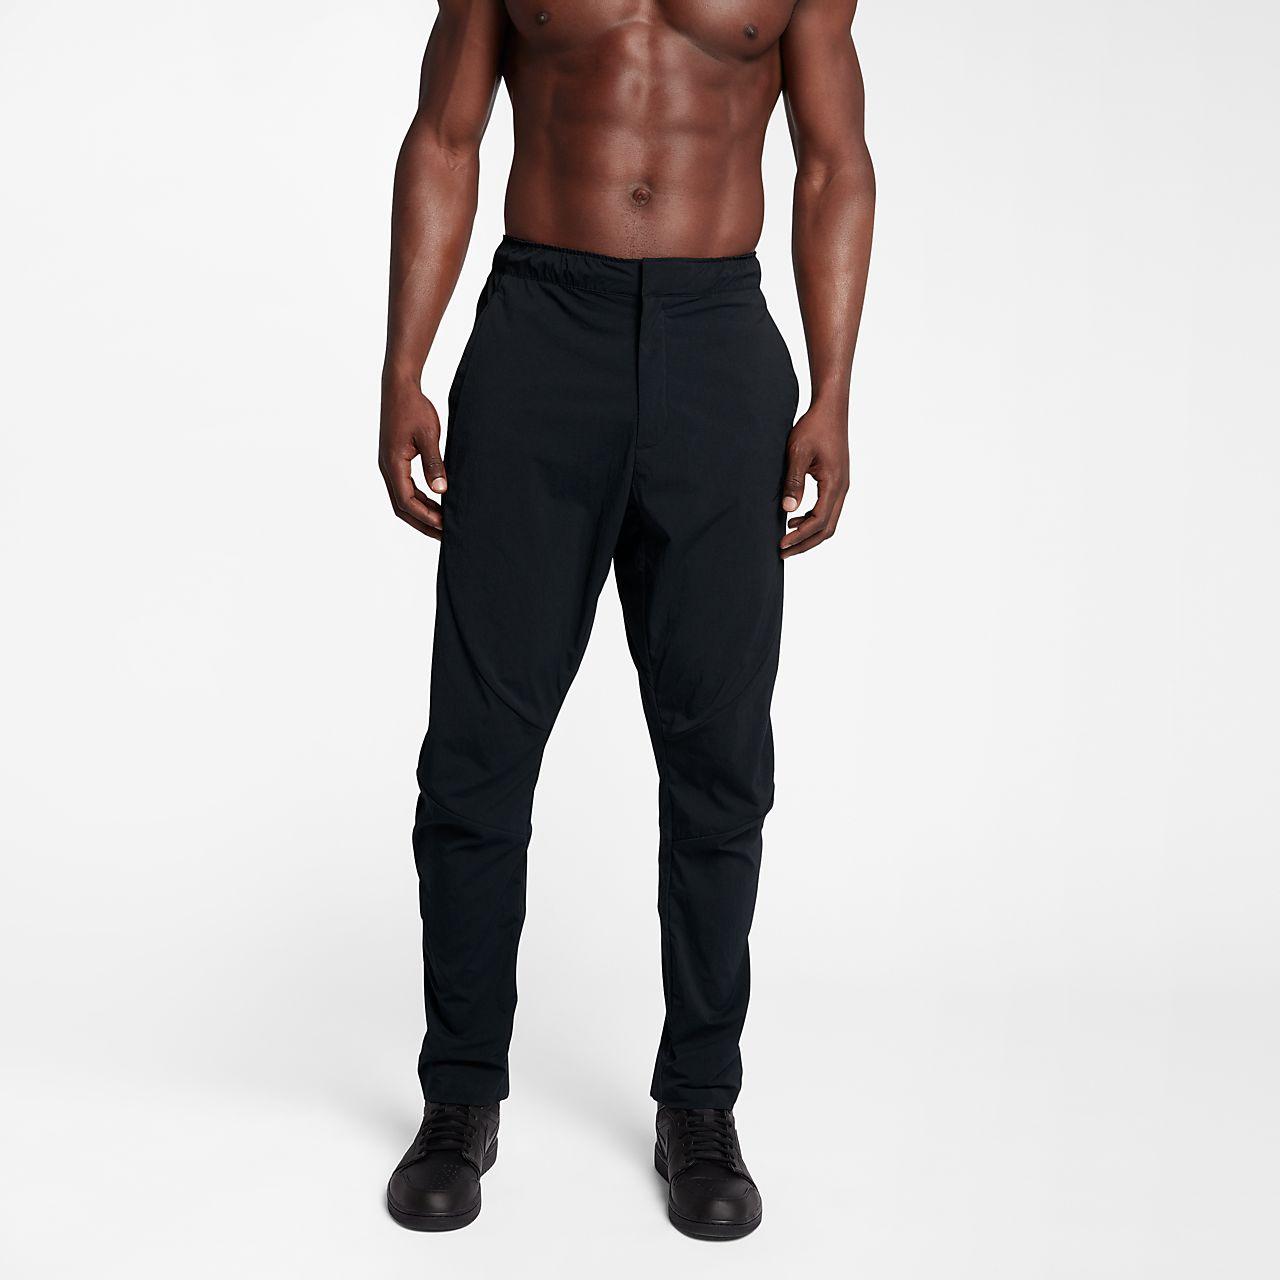 pantaloni air jordan uomo